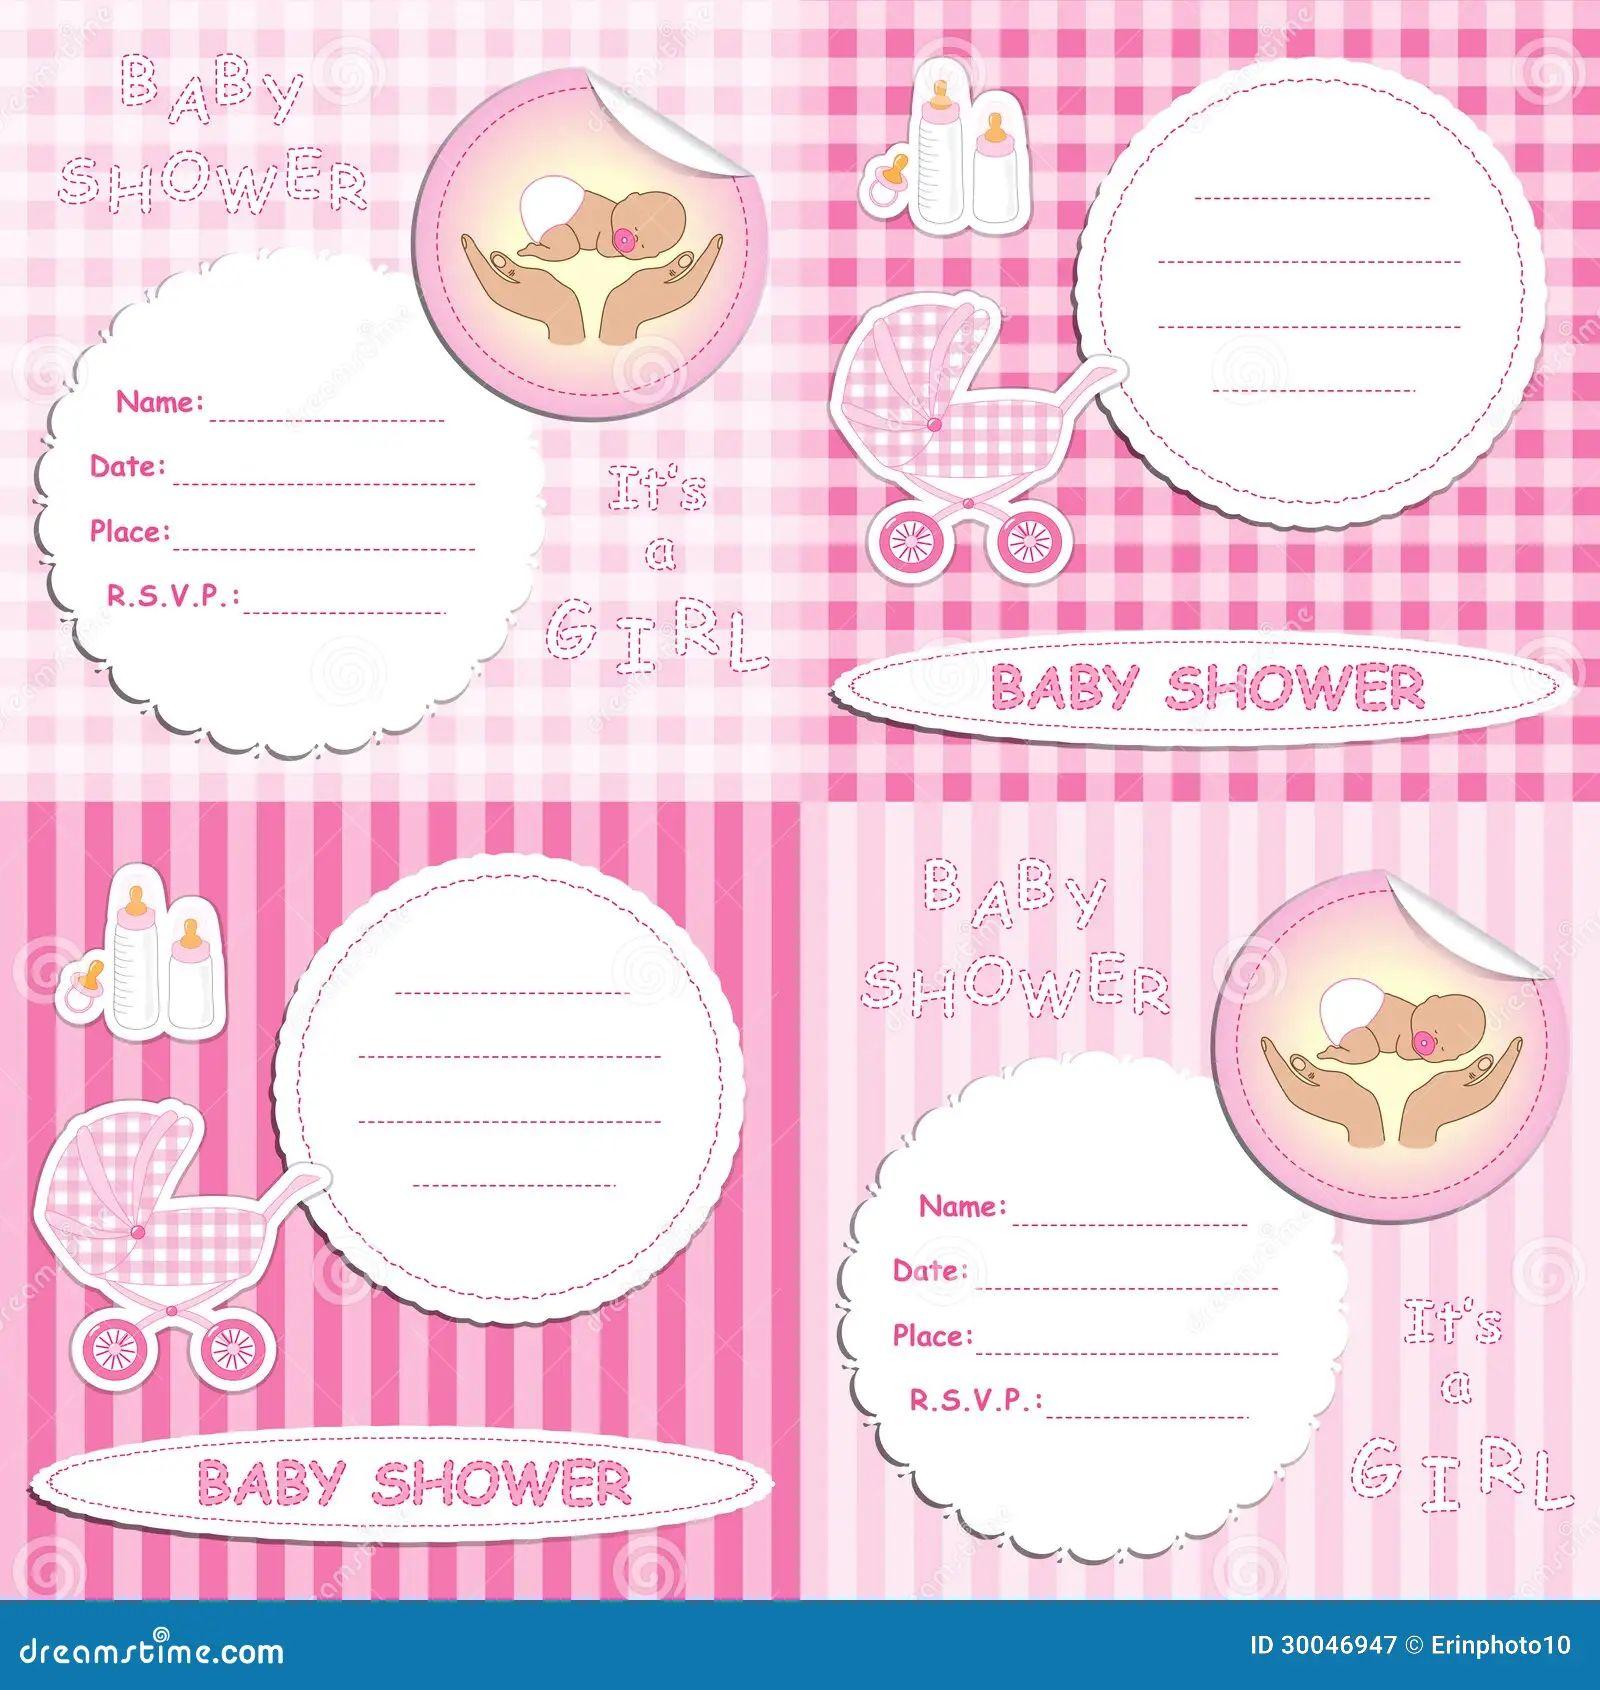 newborn baby announcement cards